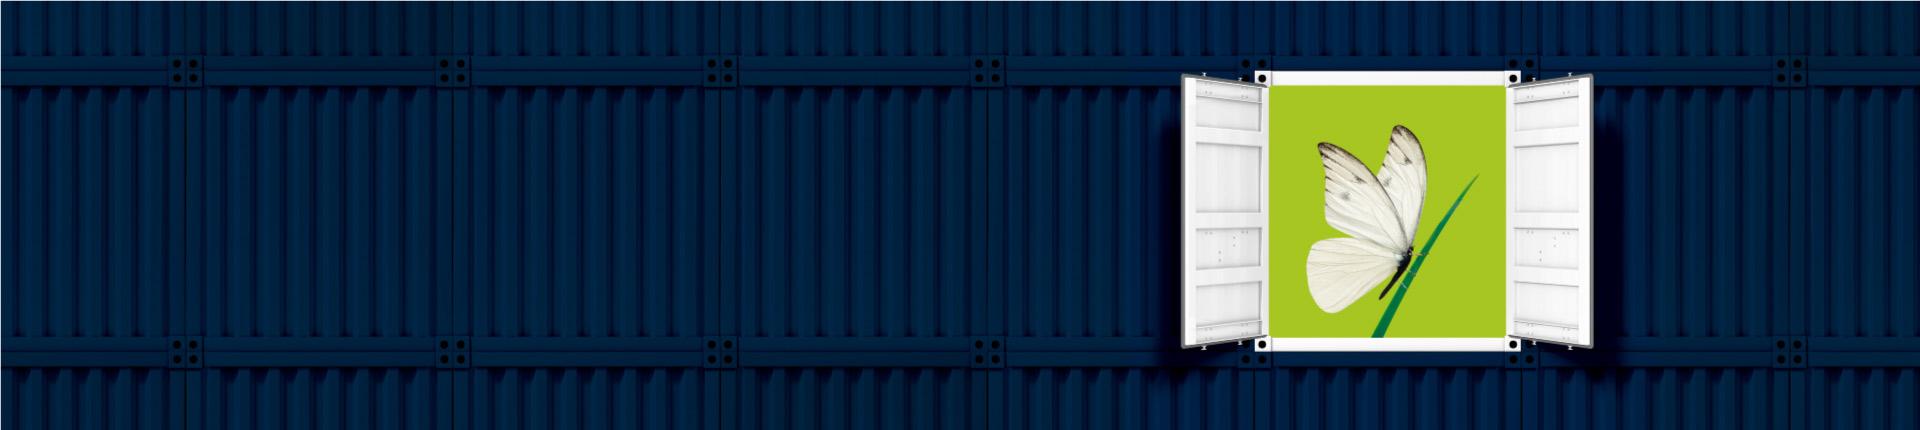 SERENITY Cargo Value Guarantee